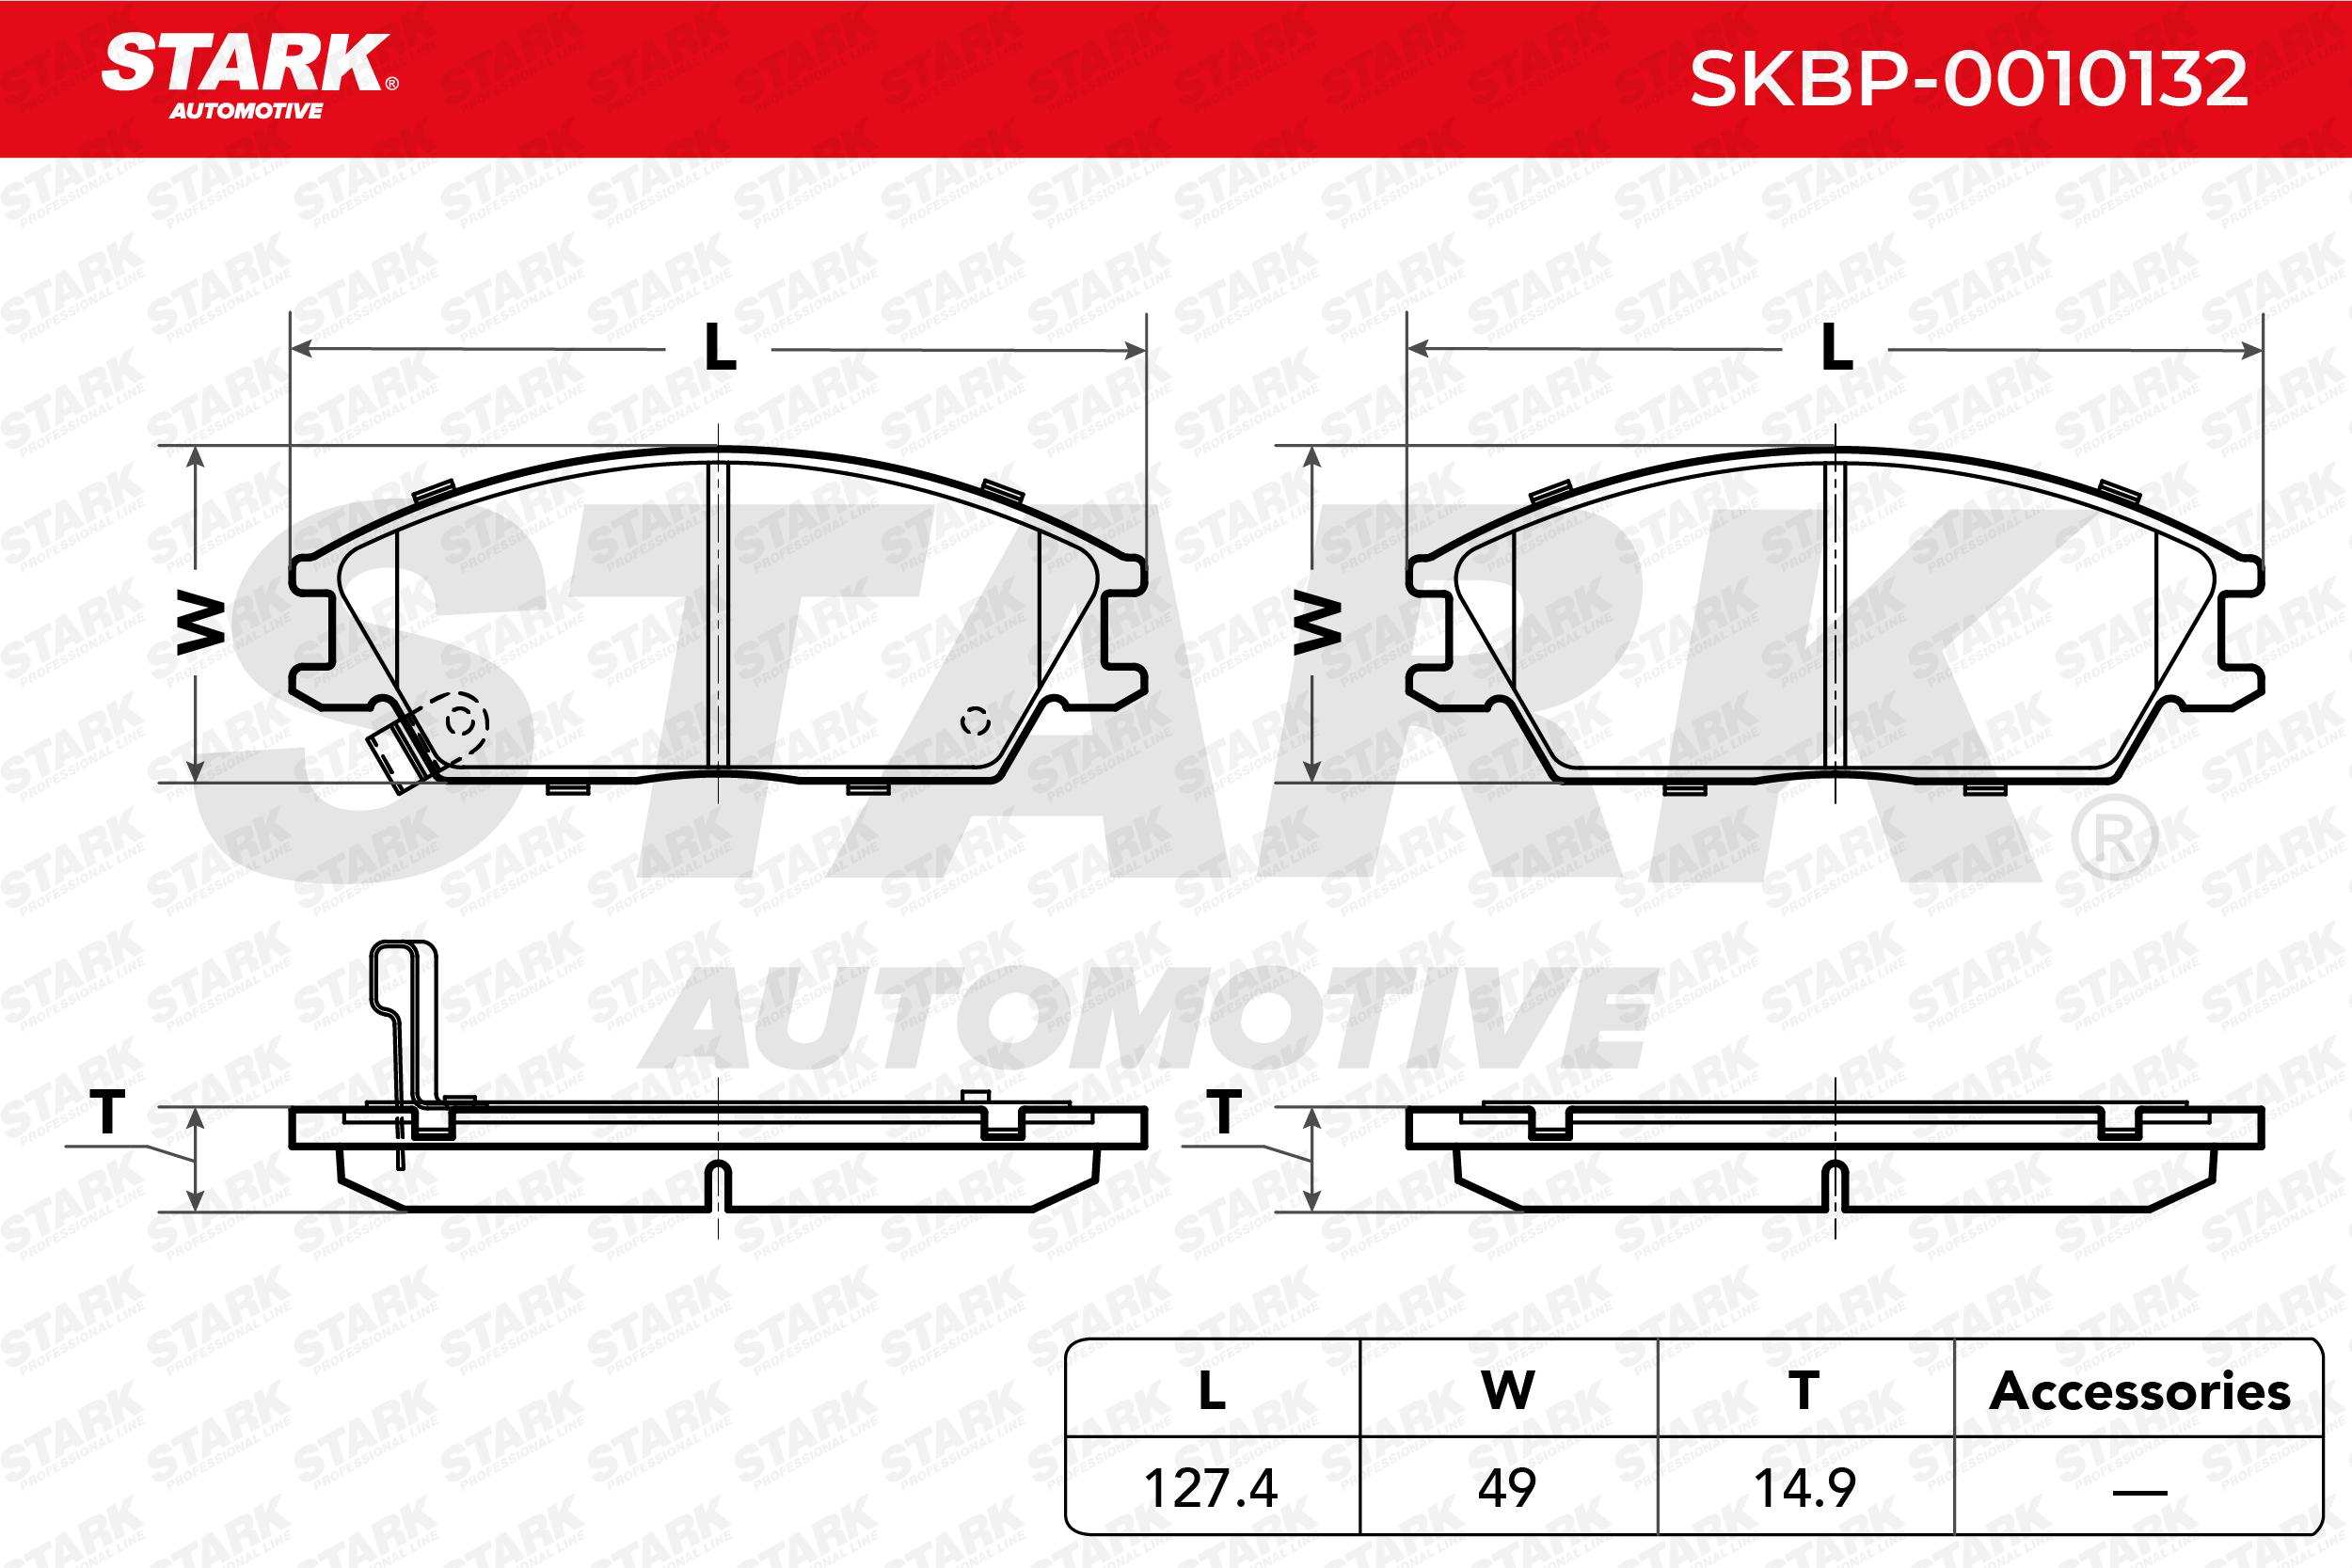 Bremsklötze STARK SKBP-0010132 4059191033140